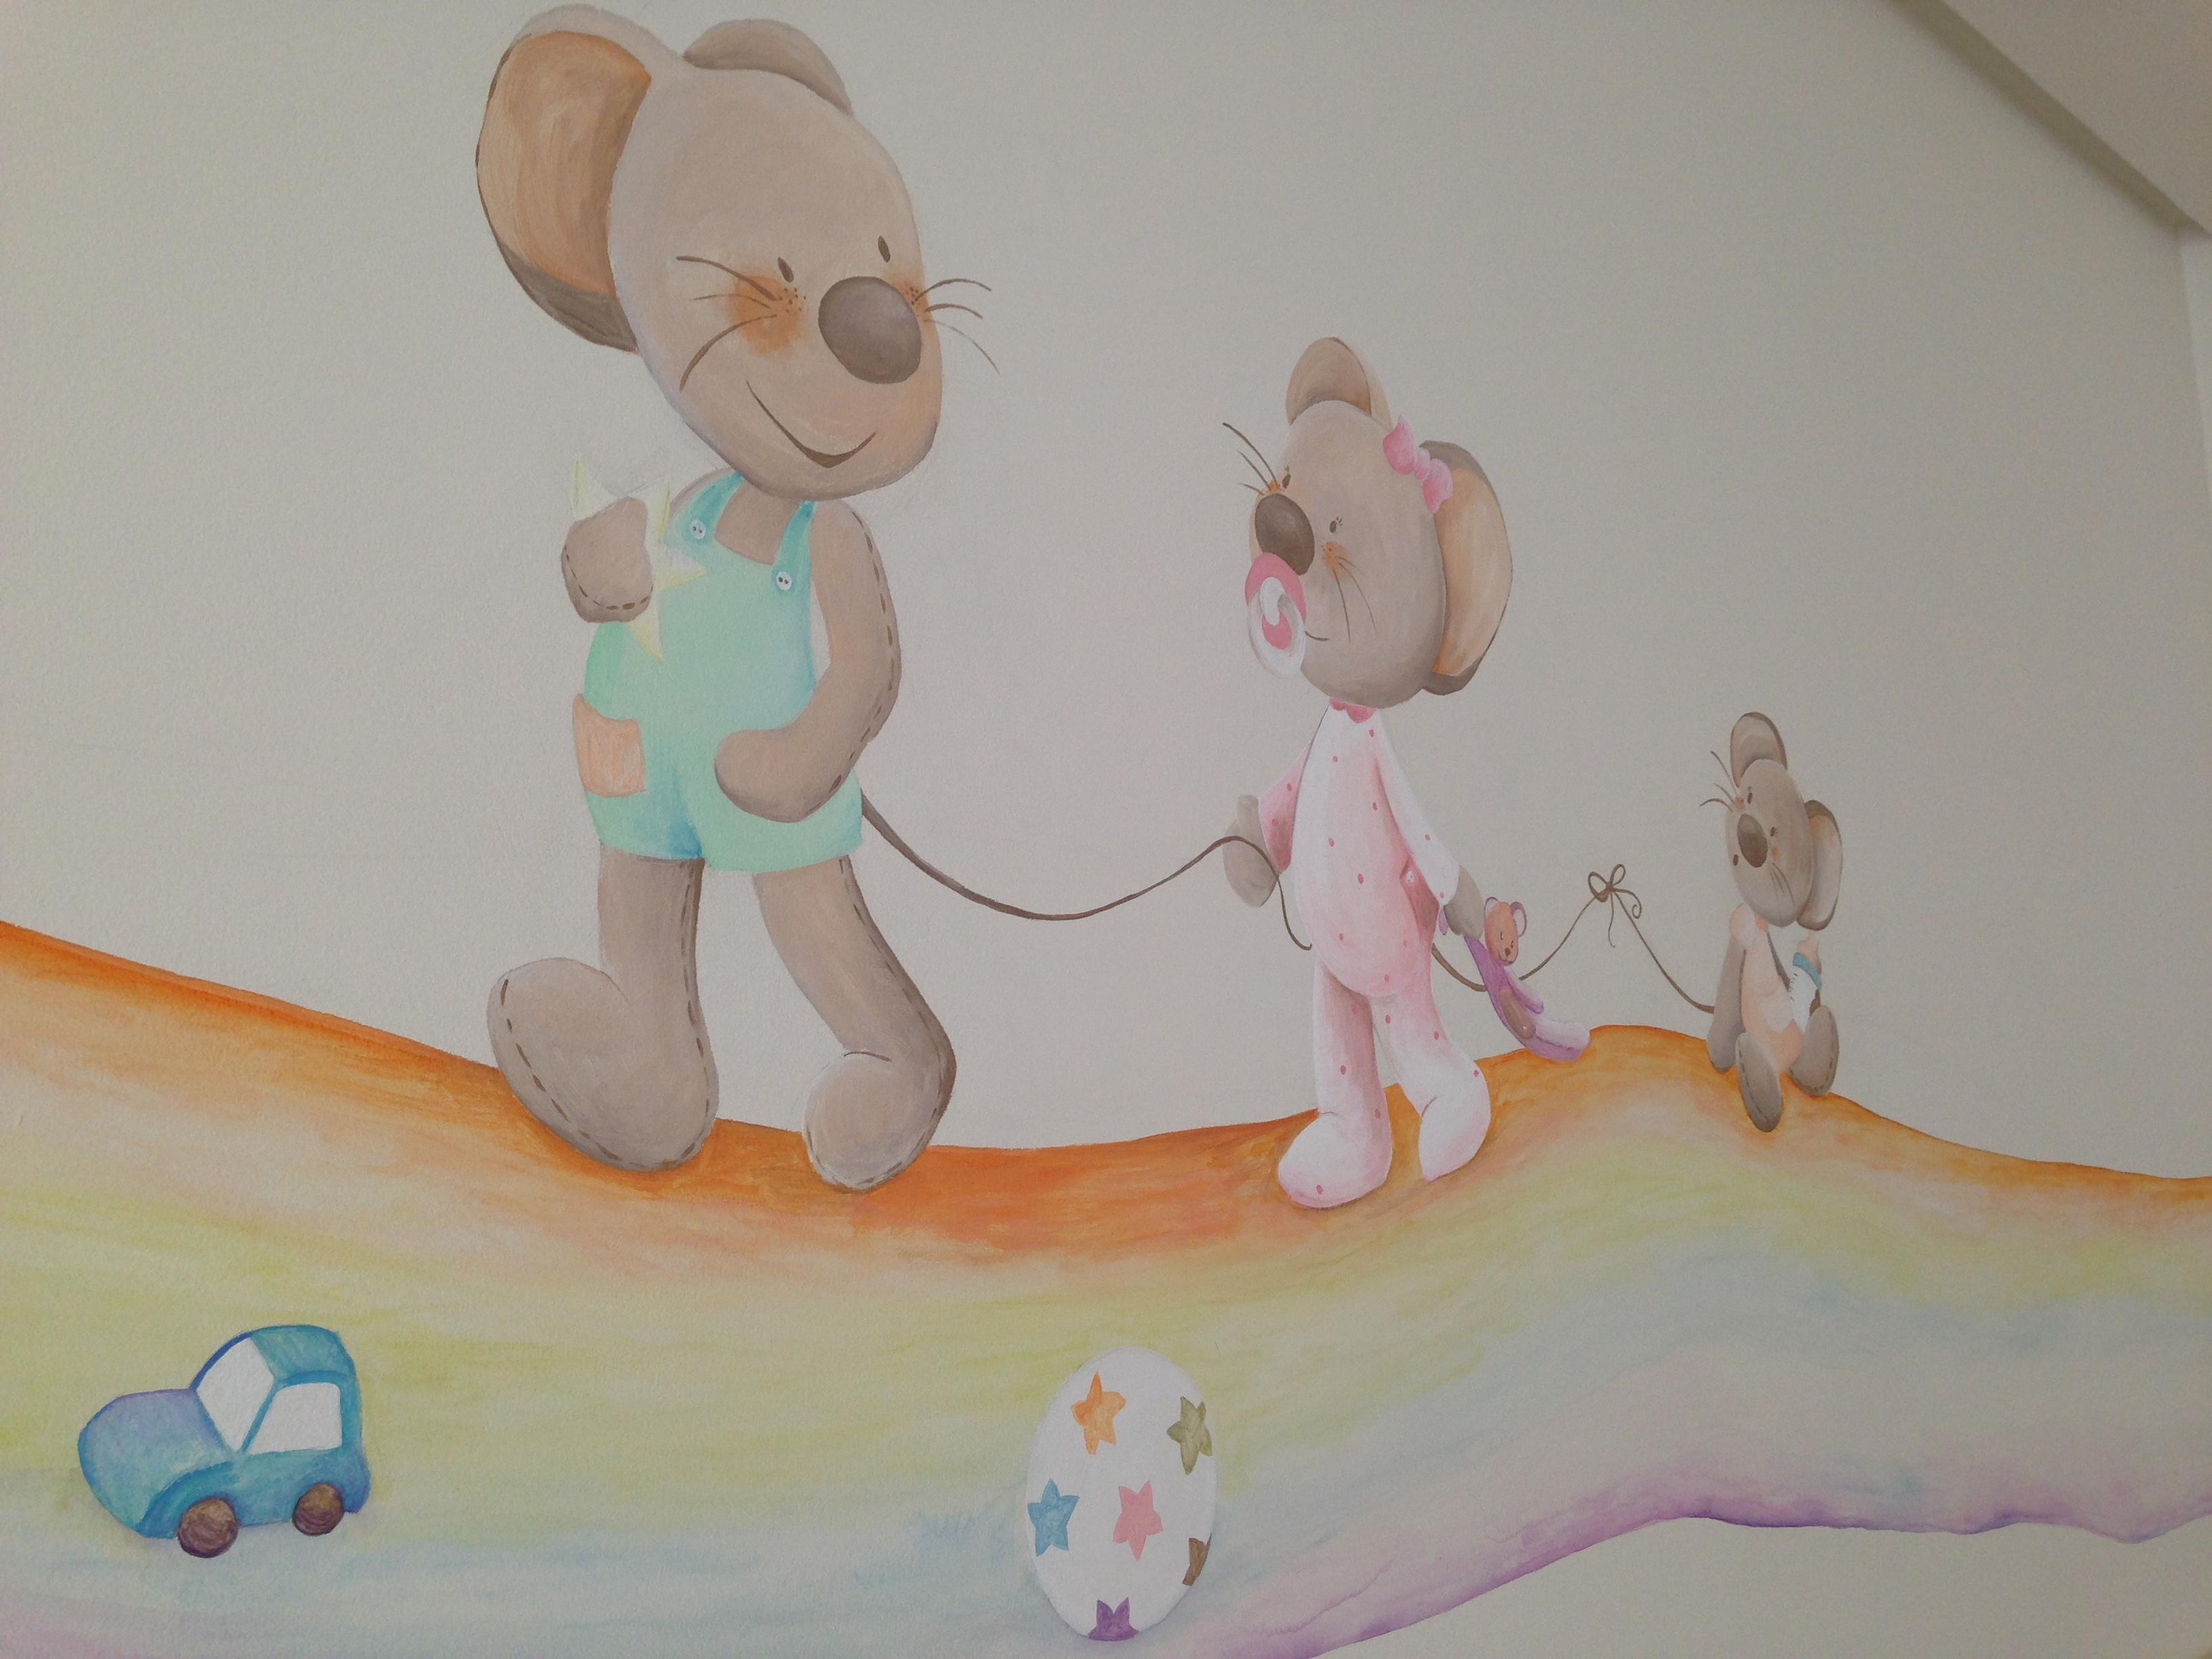 Pintura mural ratoncitos over the rainbow bgoph y - Cuadros infantiles silvia munoz ...